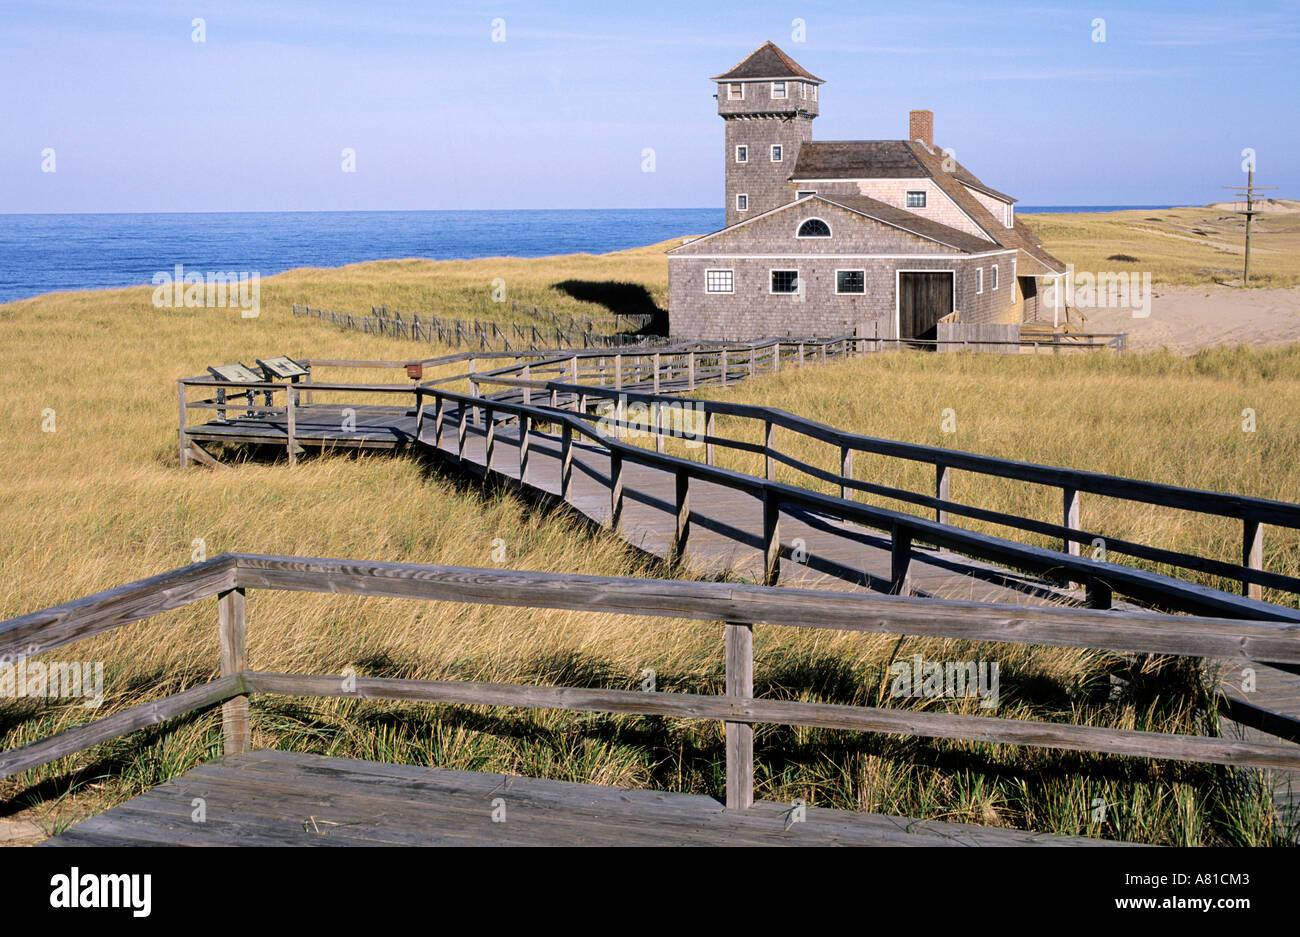 United States, Massachussetts, Cape Cod, Race Point Beach - Stock Image